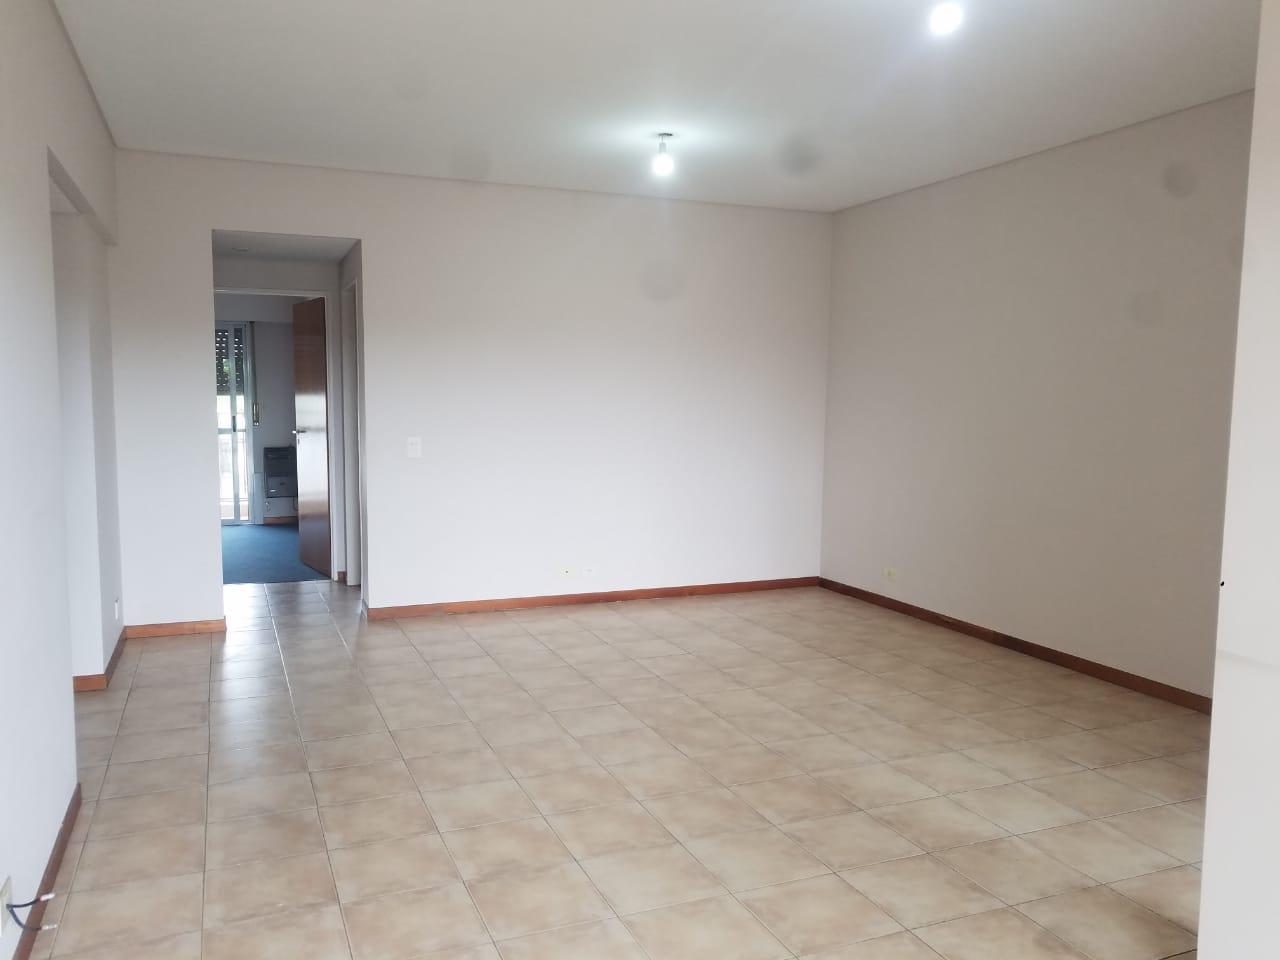 GIN - Grupo Inmobiliario Norte: